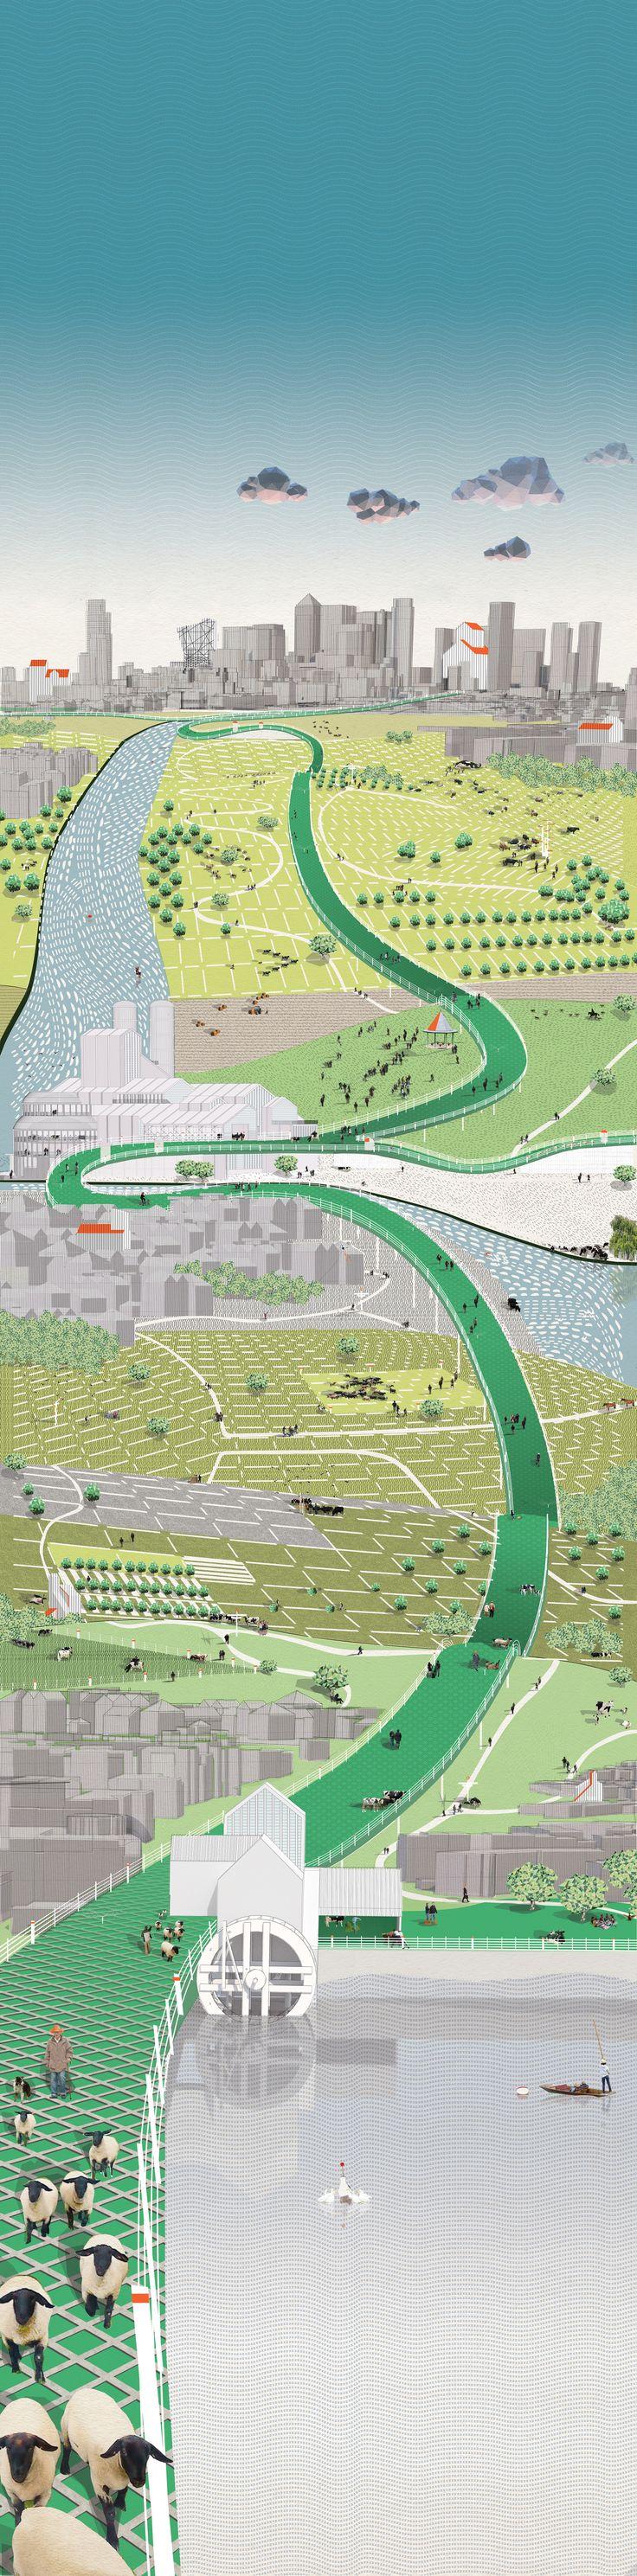 The Great British [Un]Smart City - Taylan Tahir